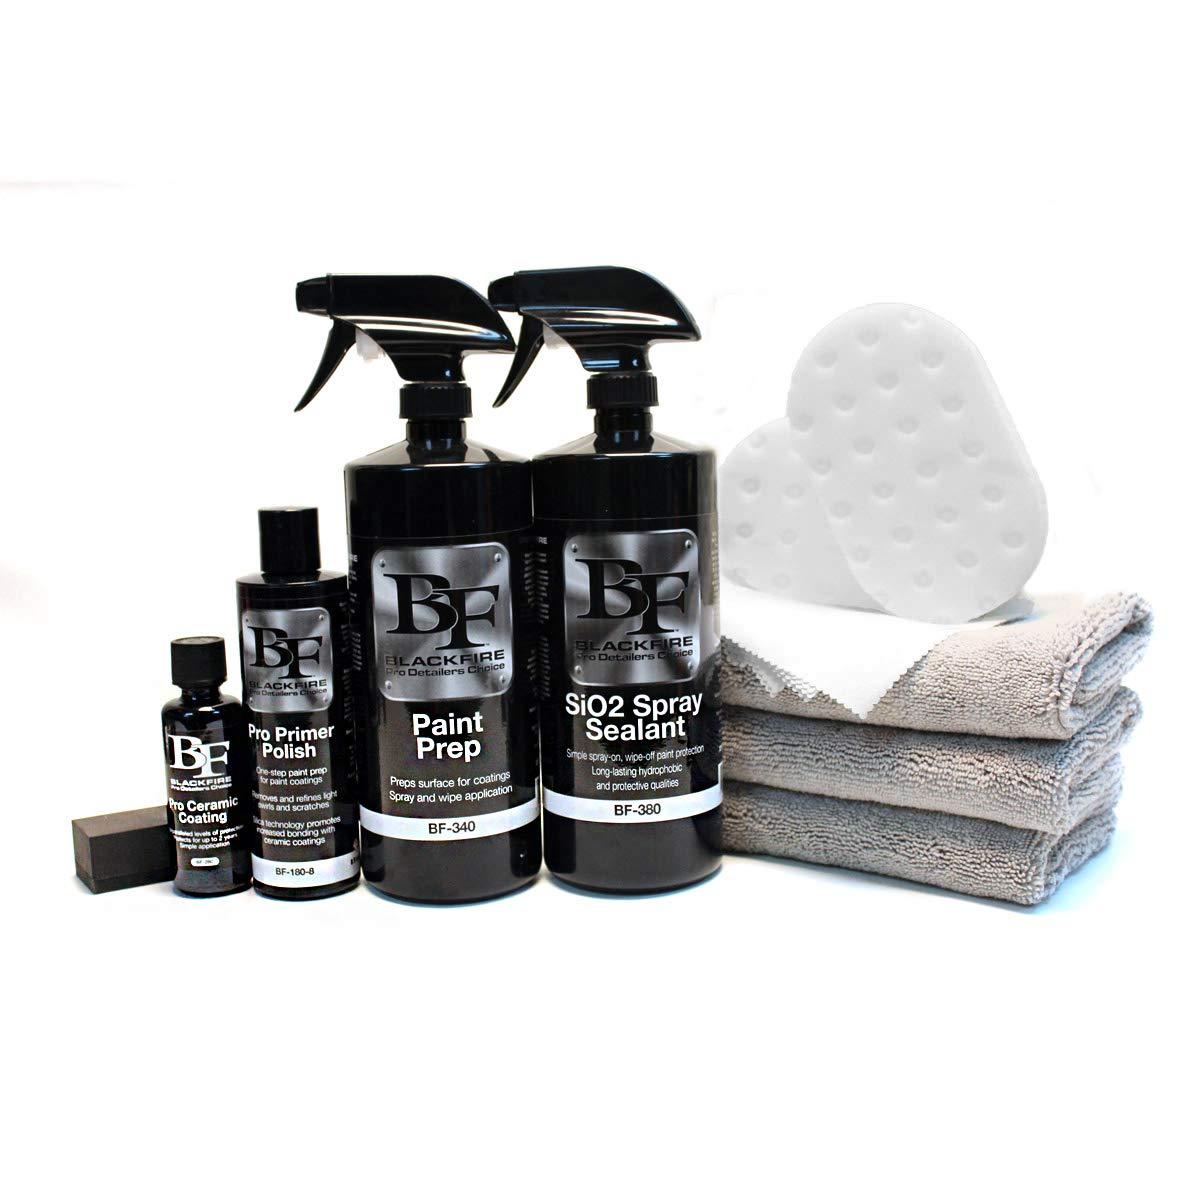 BLACKFIRE Pro Ceramic Coating Complete Kit